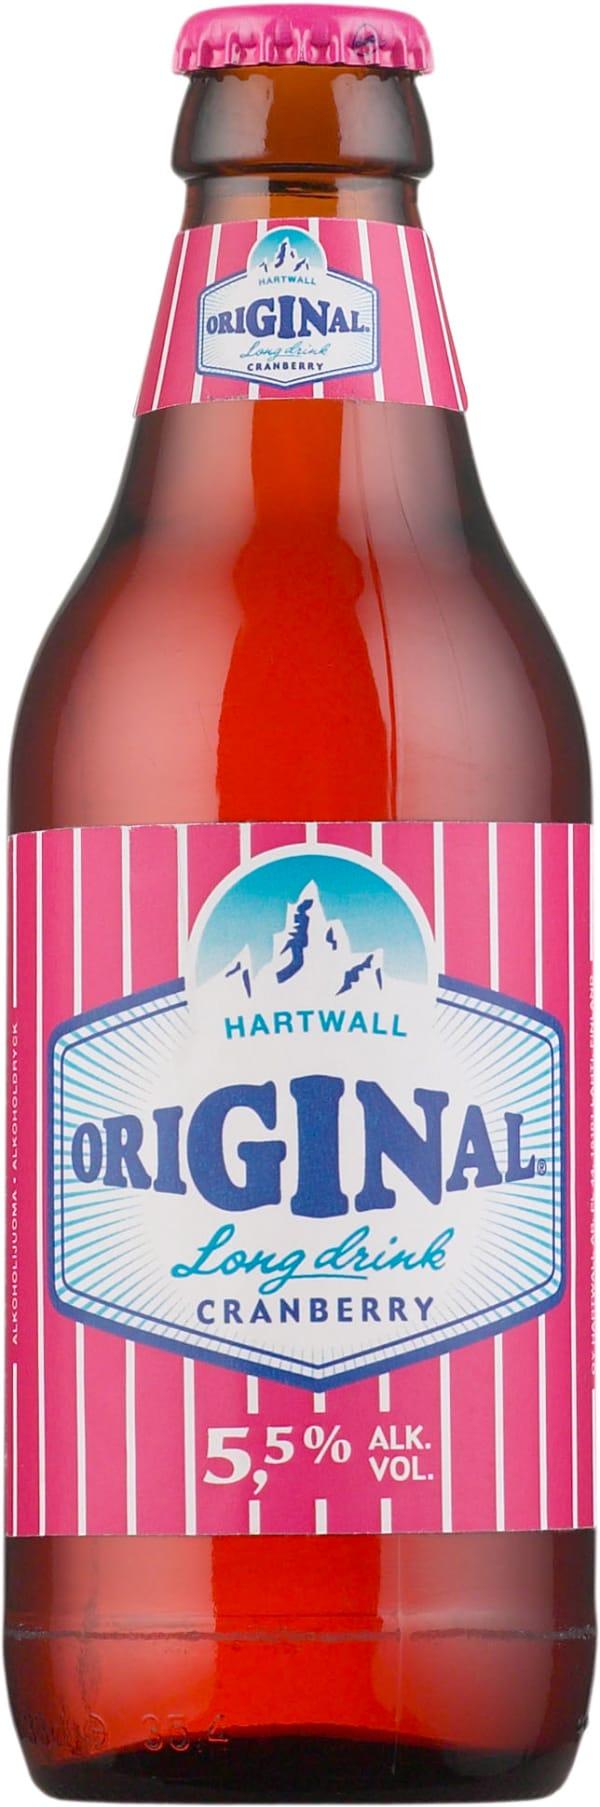 Original Long Drink Cranberry